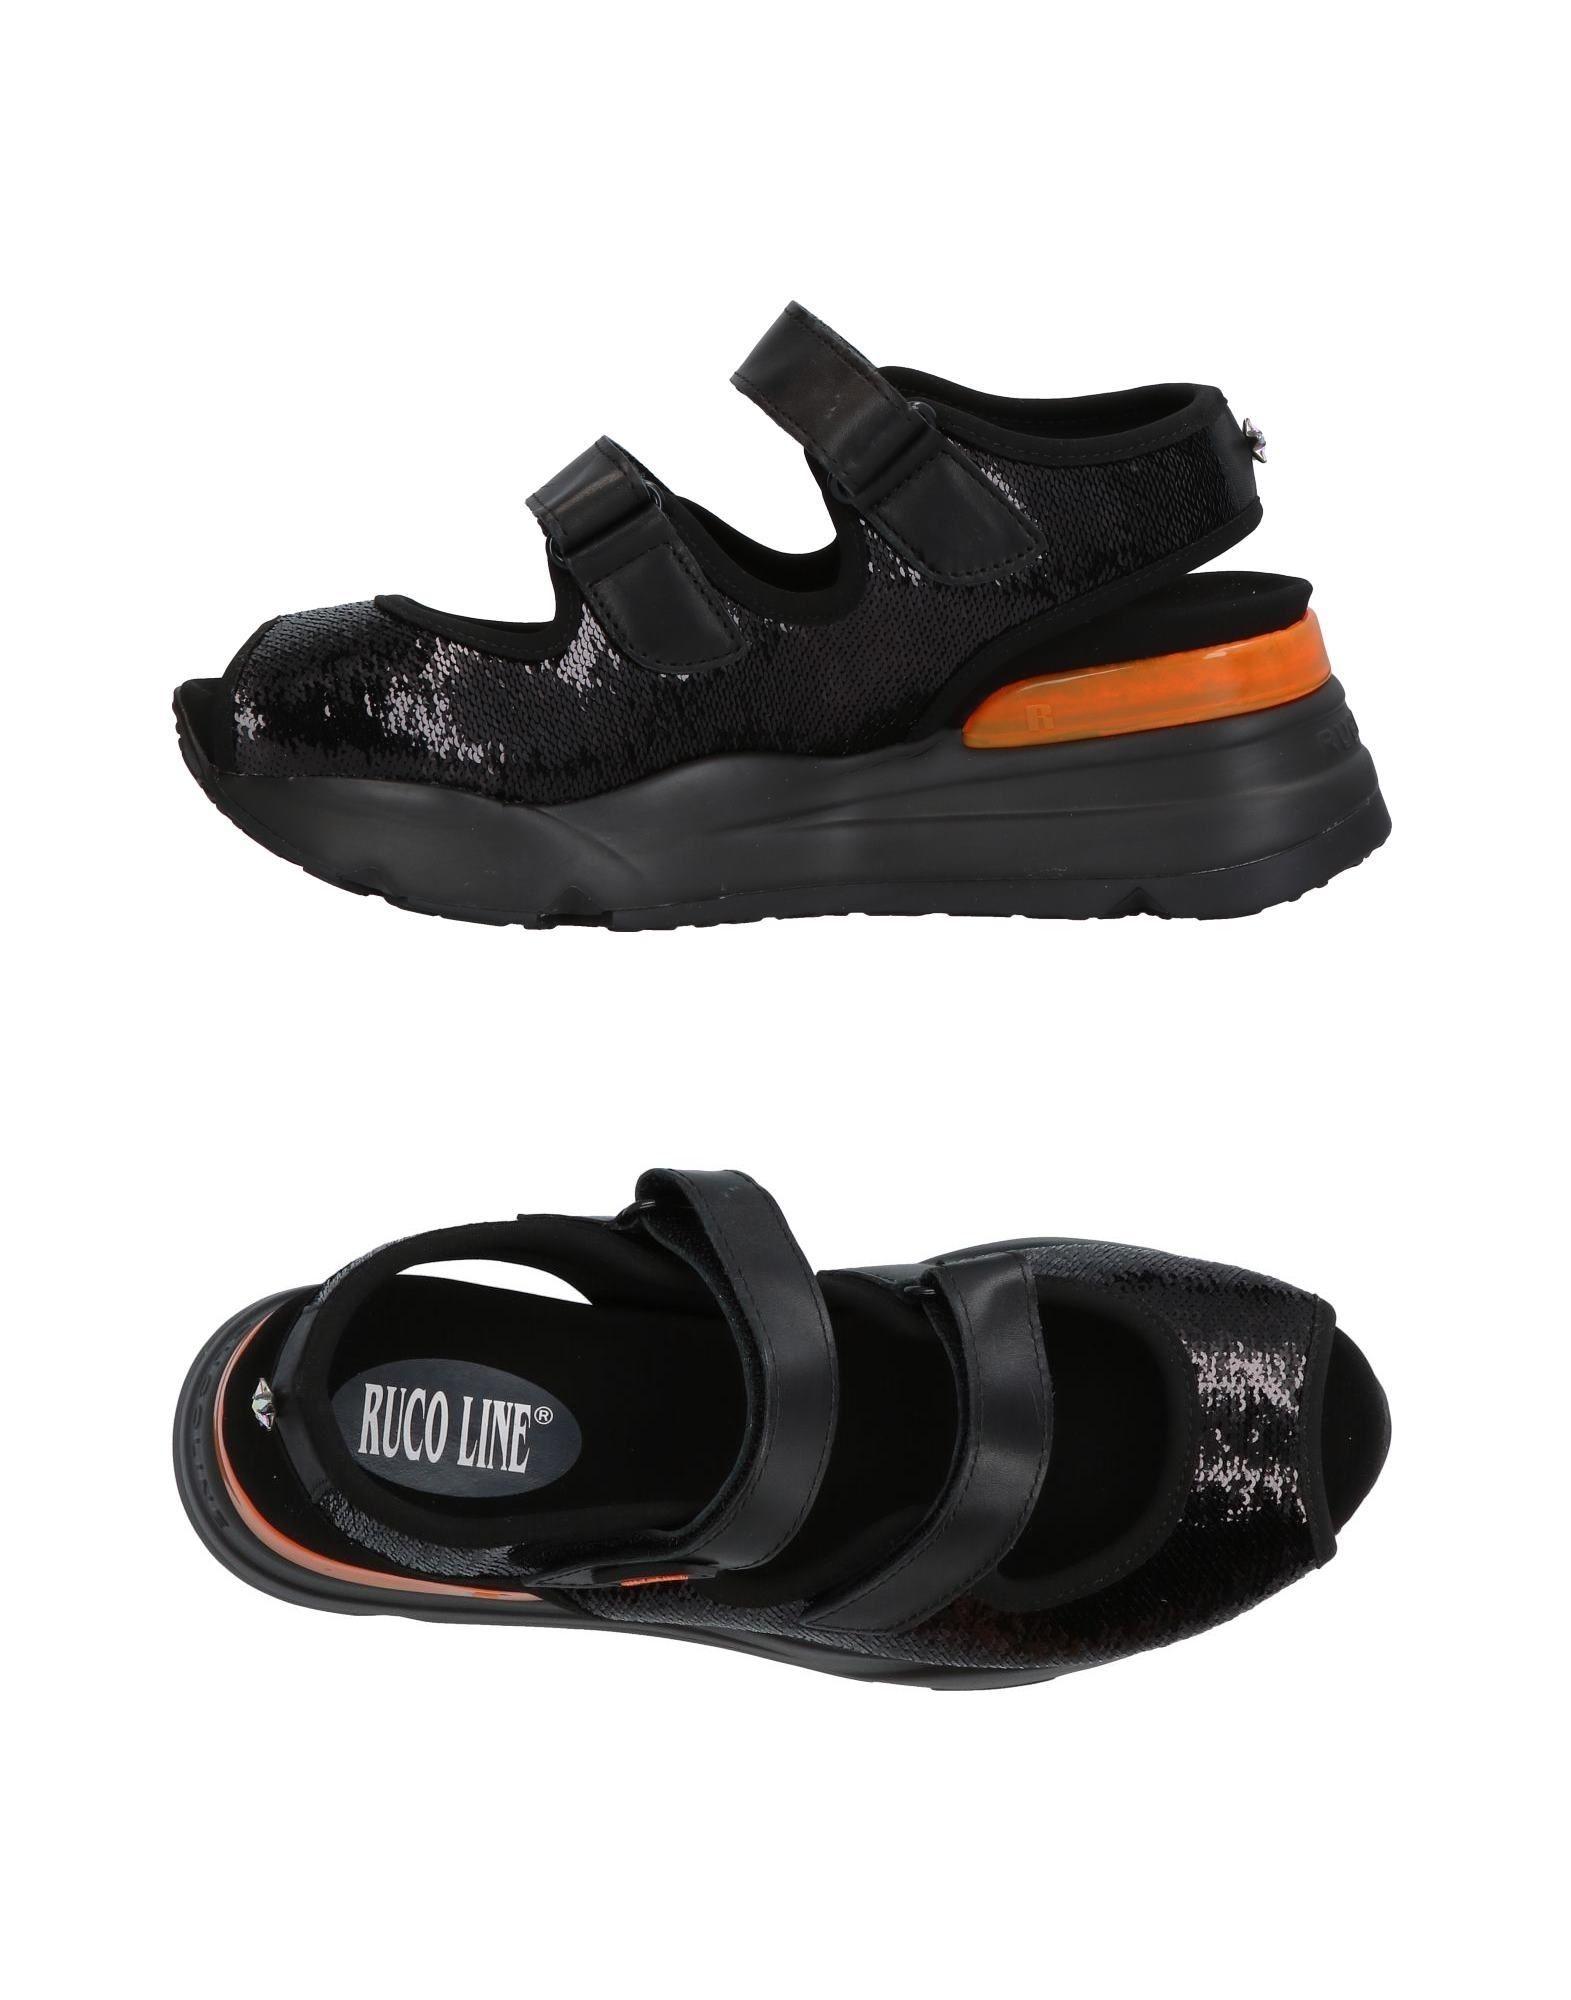 Ruco Line Sandalen Damen  11334982KV Gute Qualität beliebte Schuhe